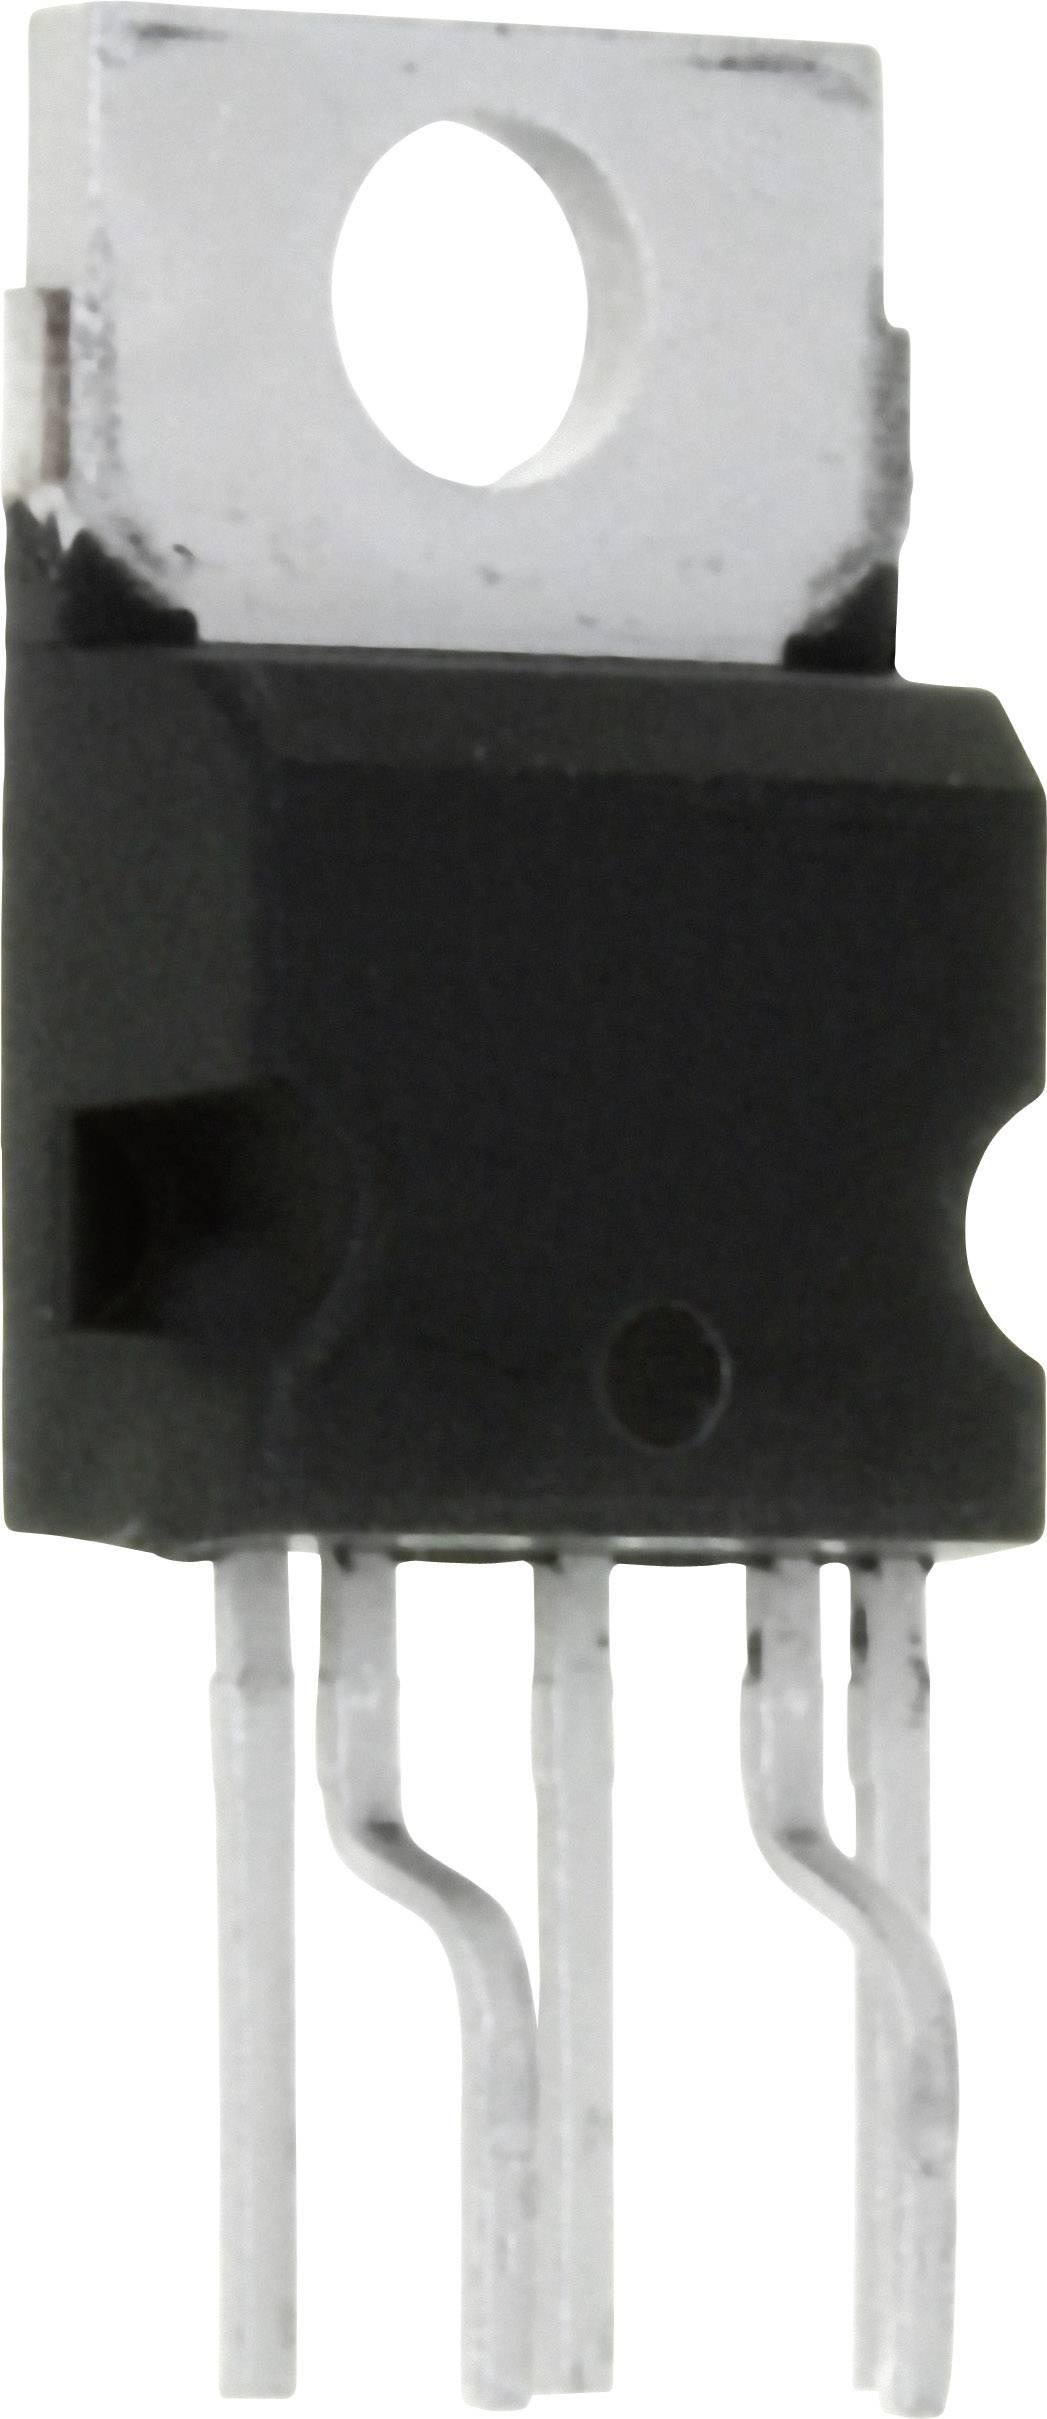 PMICAC/DCmenič,offlineprepínač STMicroelectronics VIPER100A-22-E, PENTAWATT-5